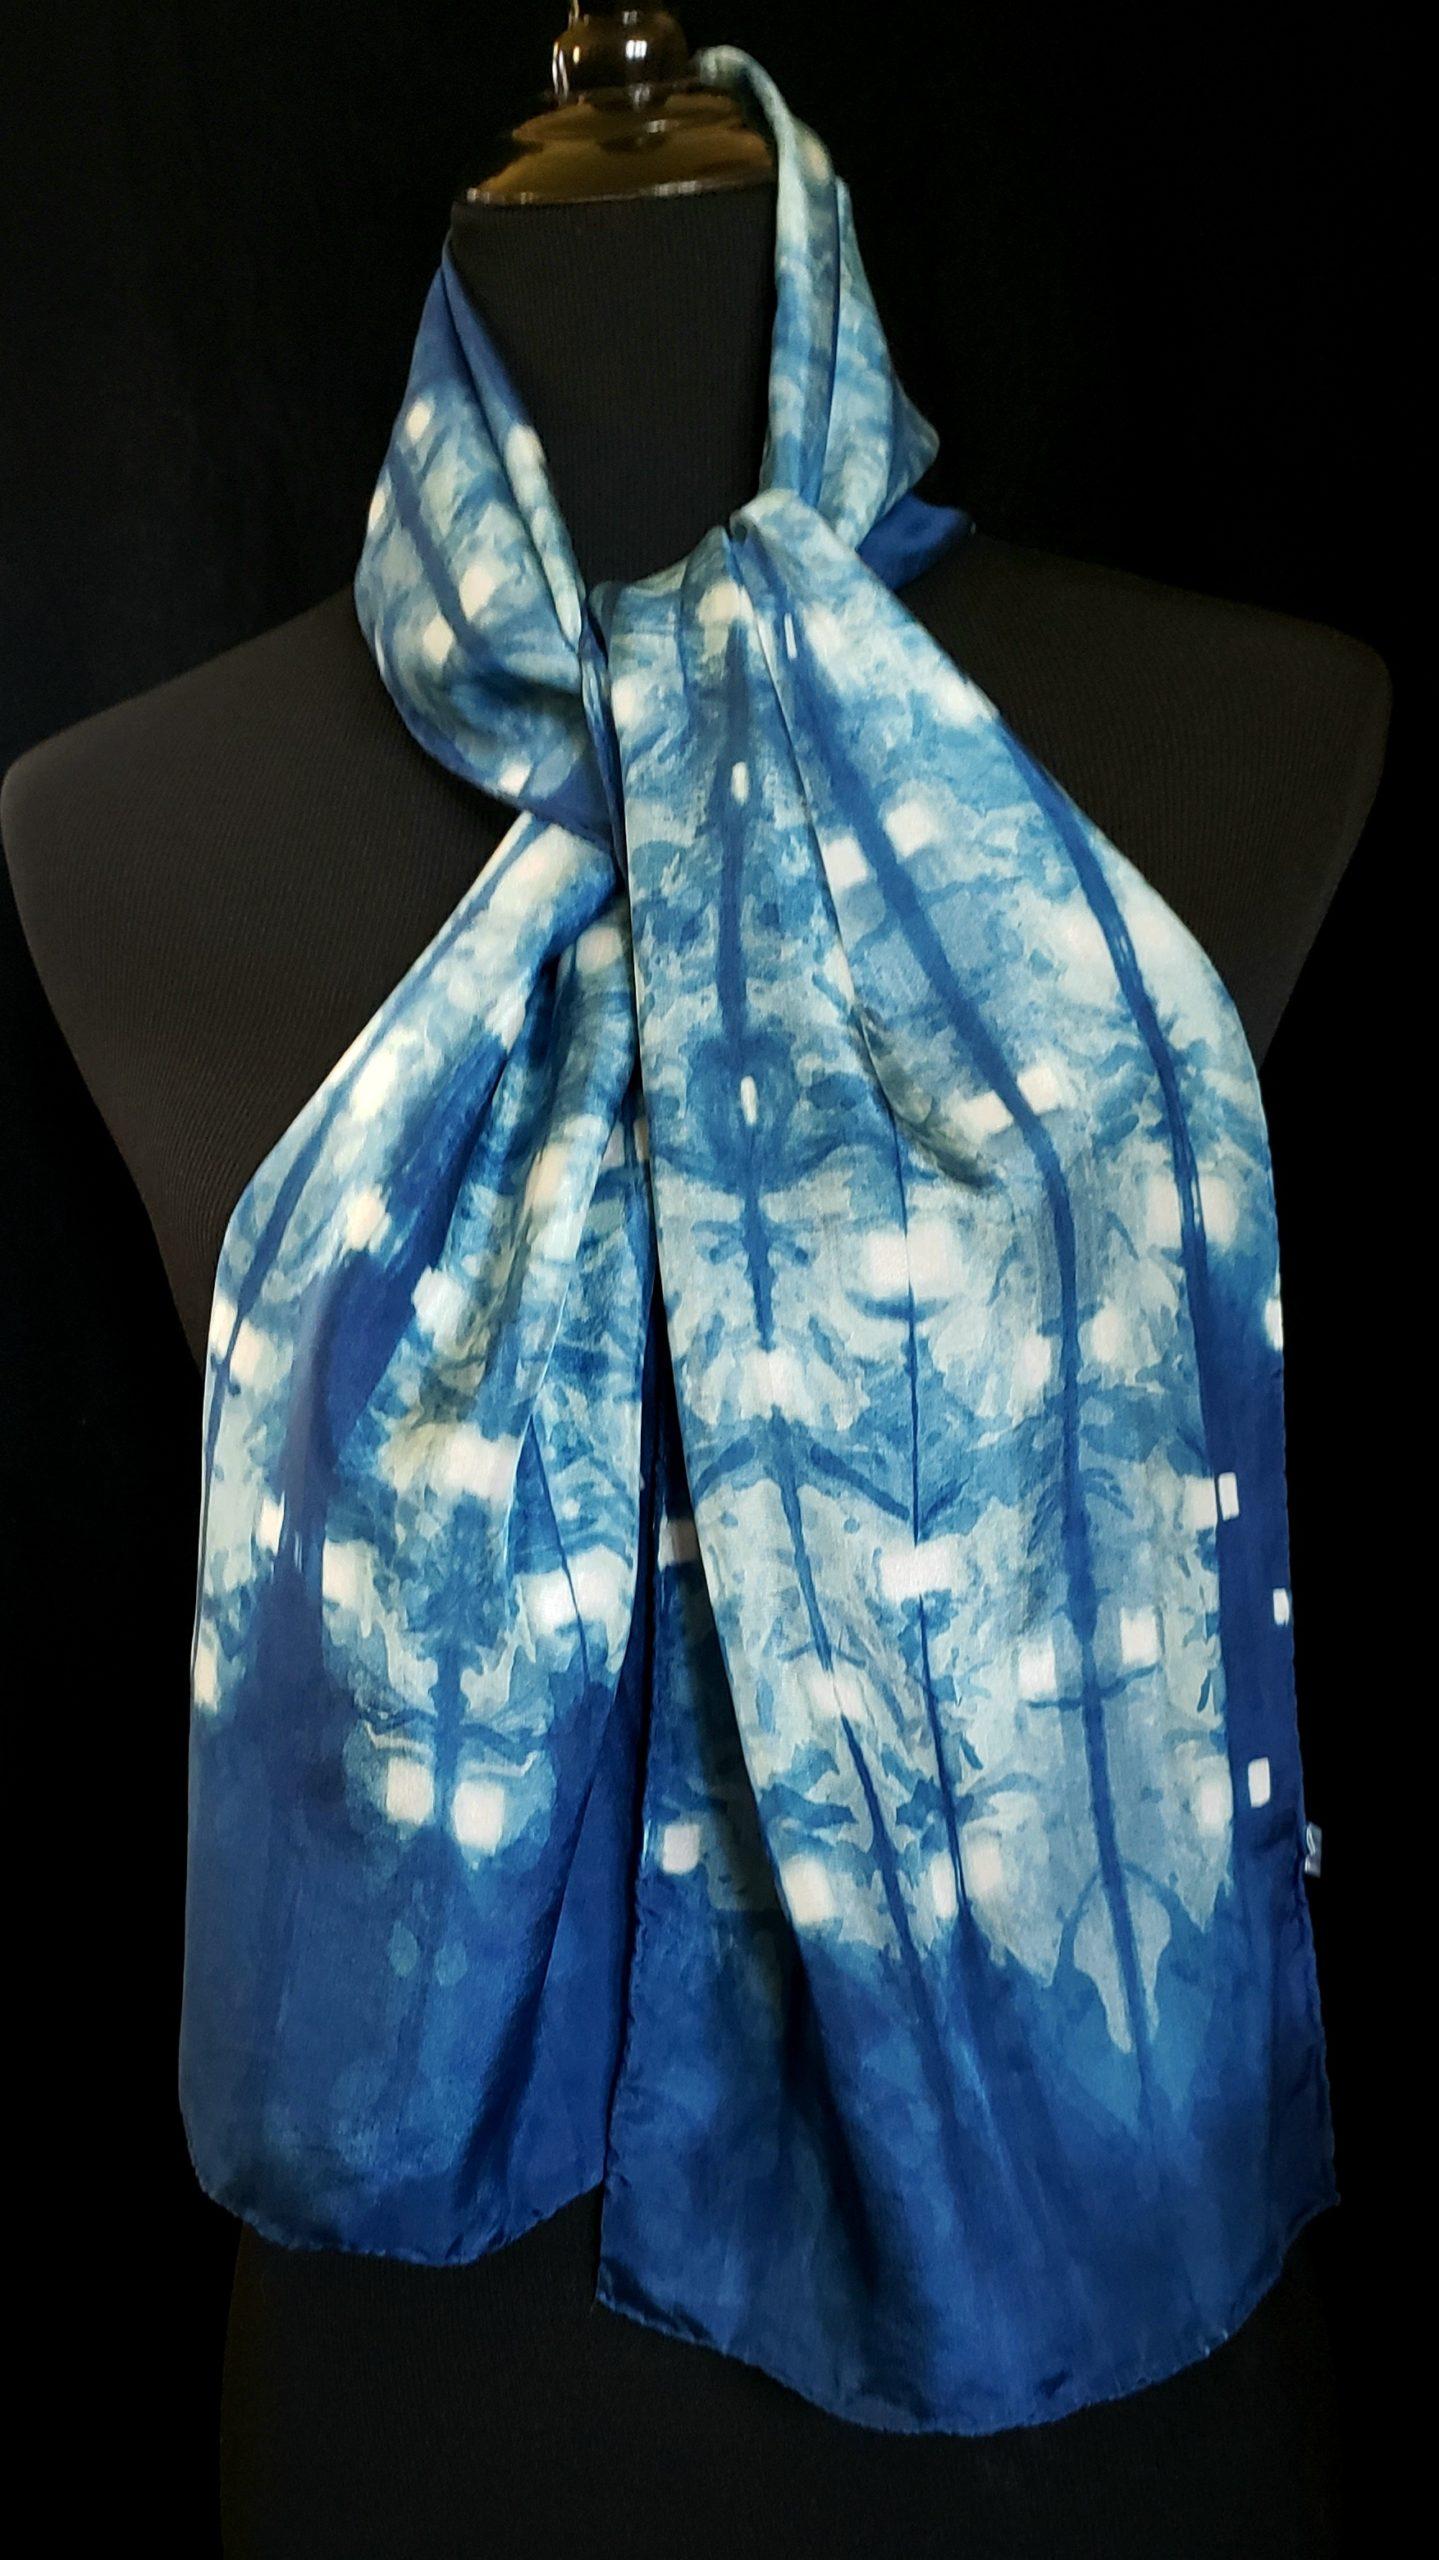 ndigIndigo Shibori dyed silk scarf